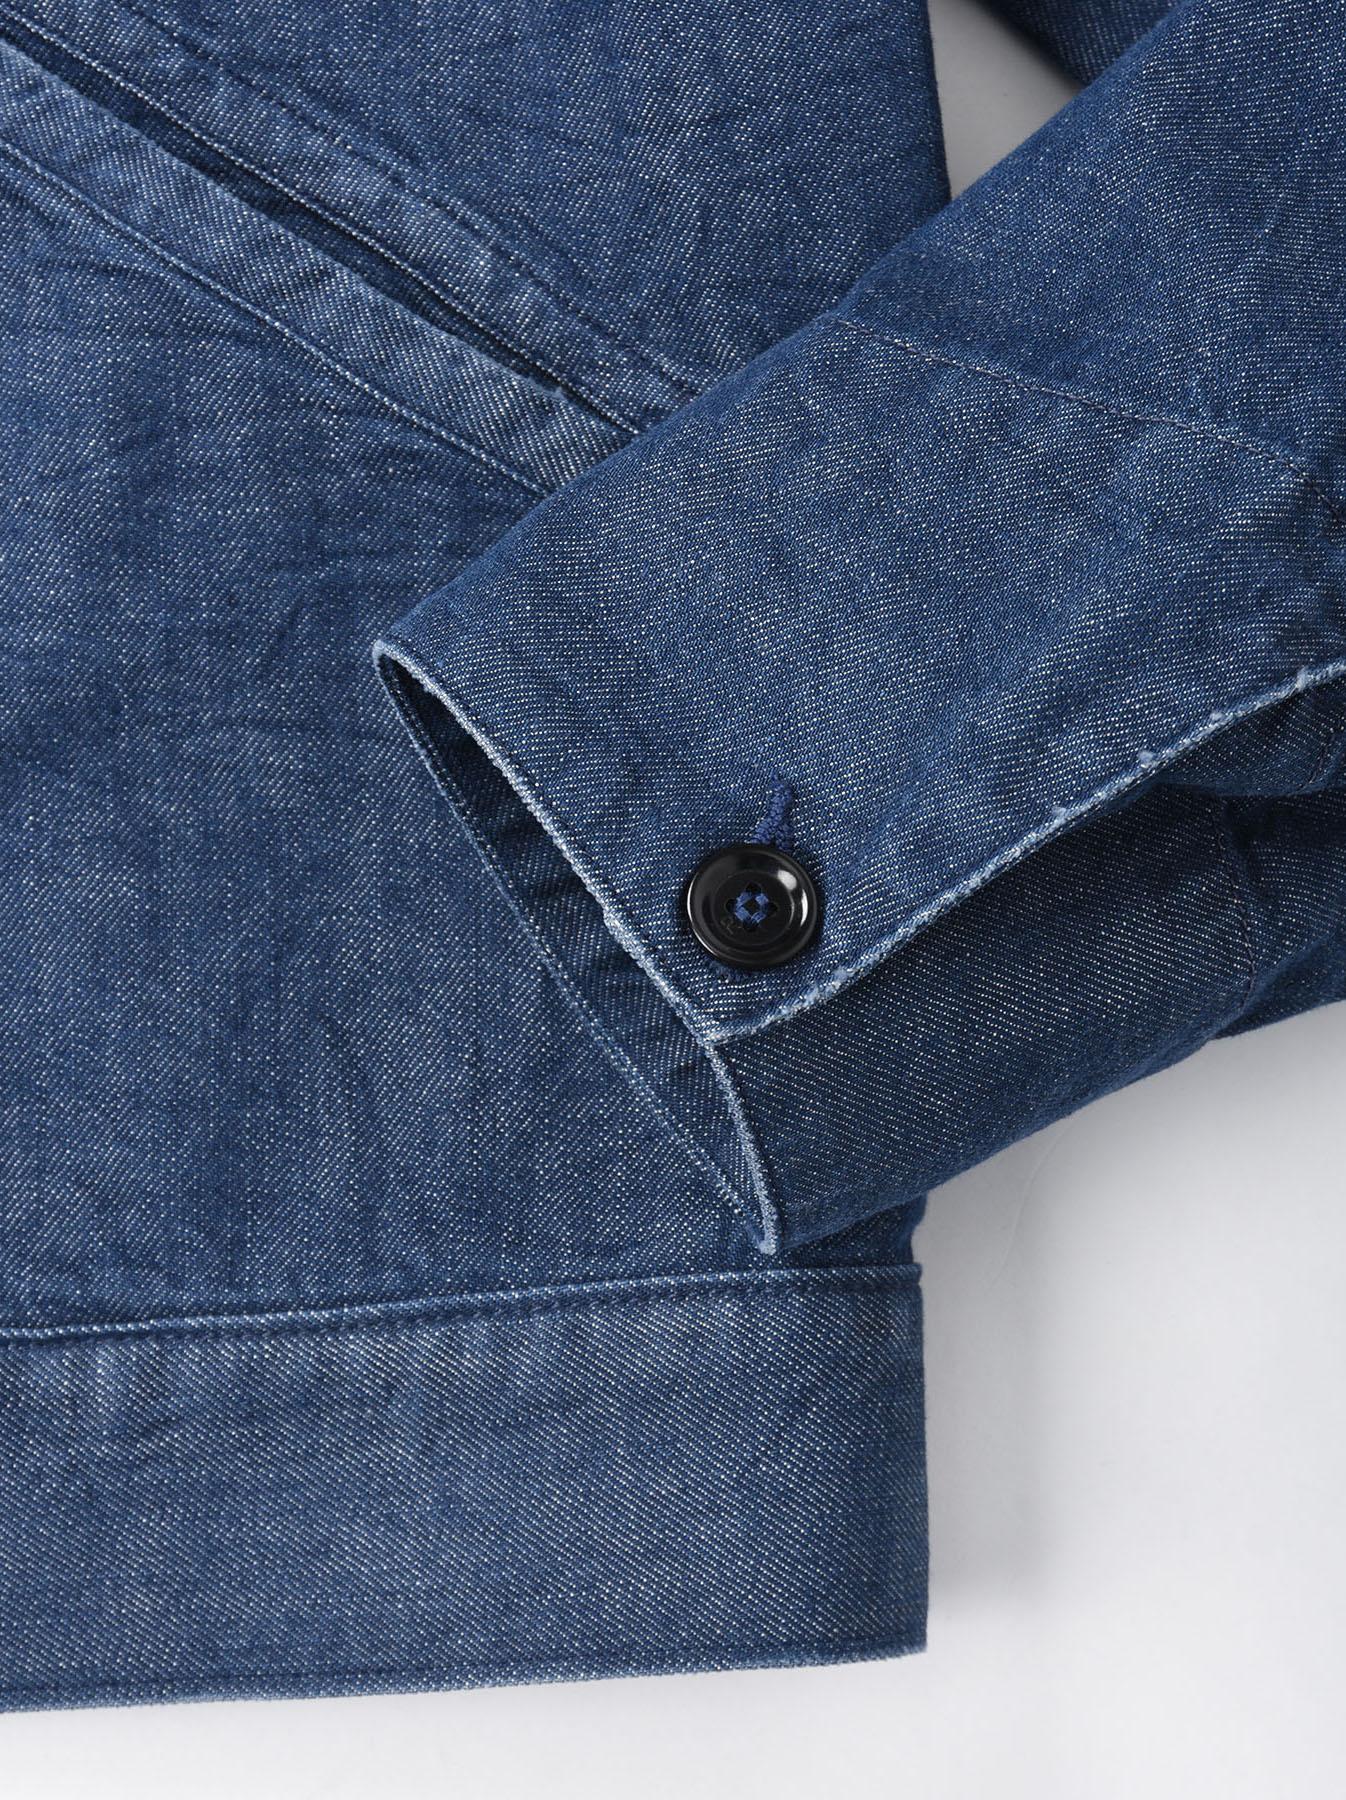 Distressed Mugi Denim Jacket-9